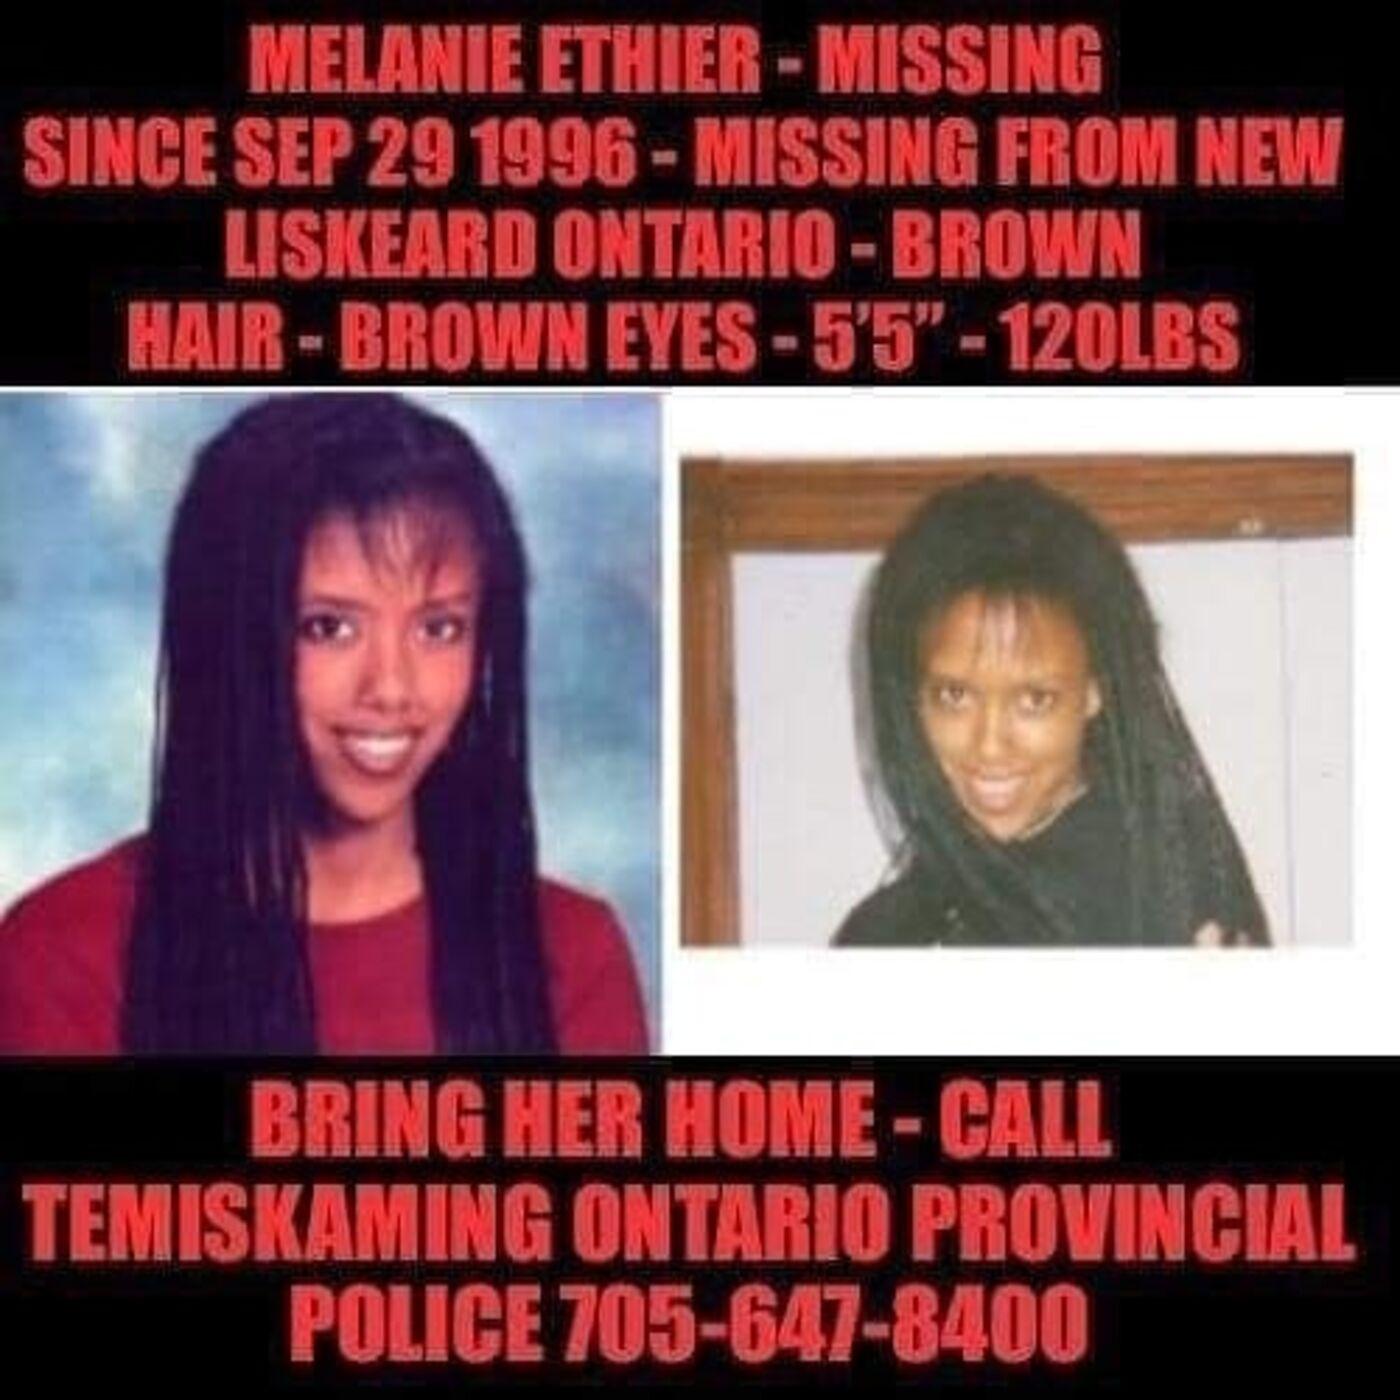 S1 E5 Melanie Ethier: 24 Years Later